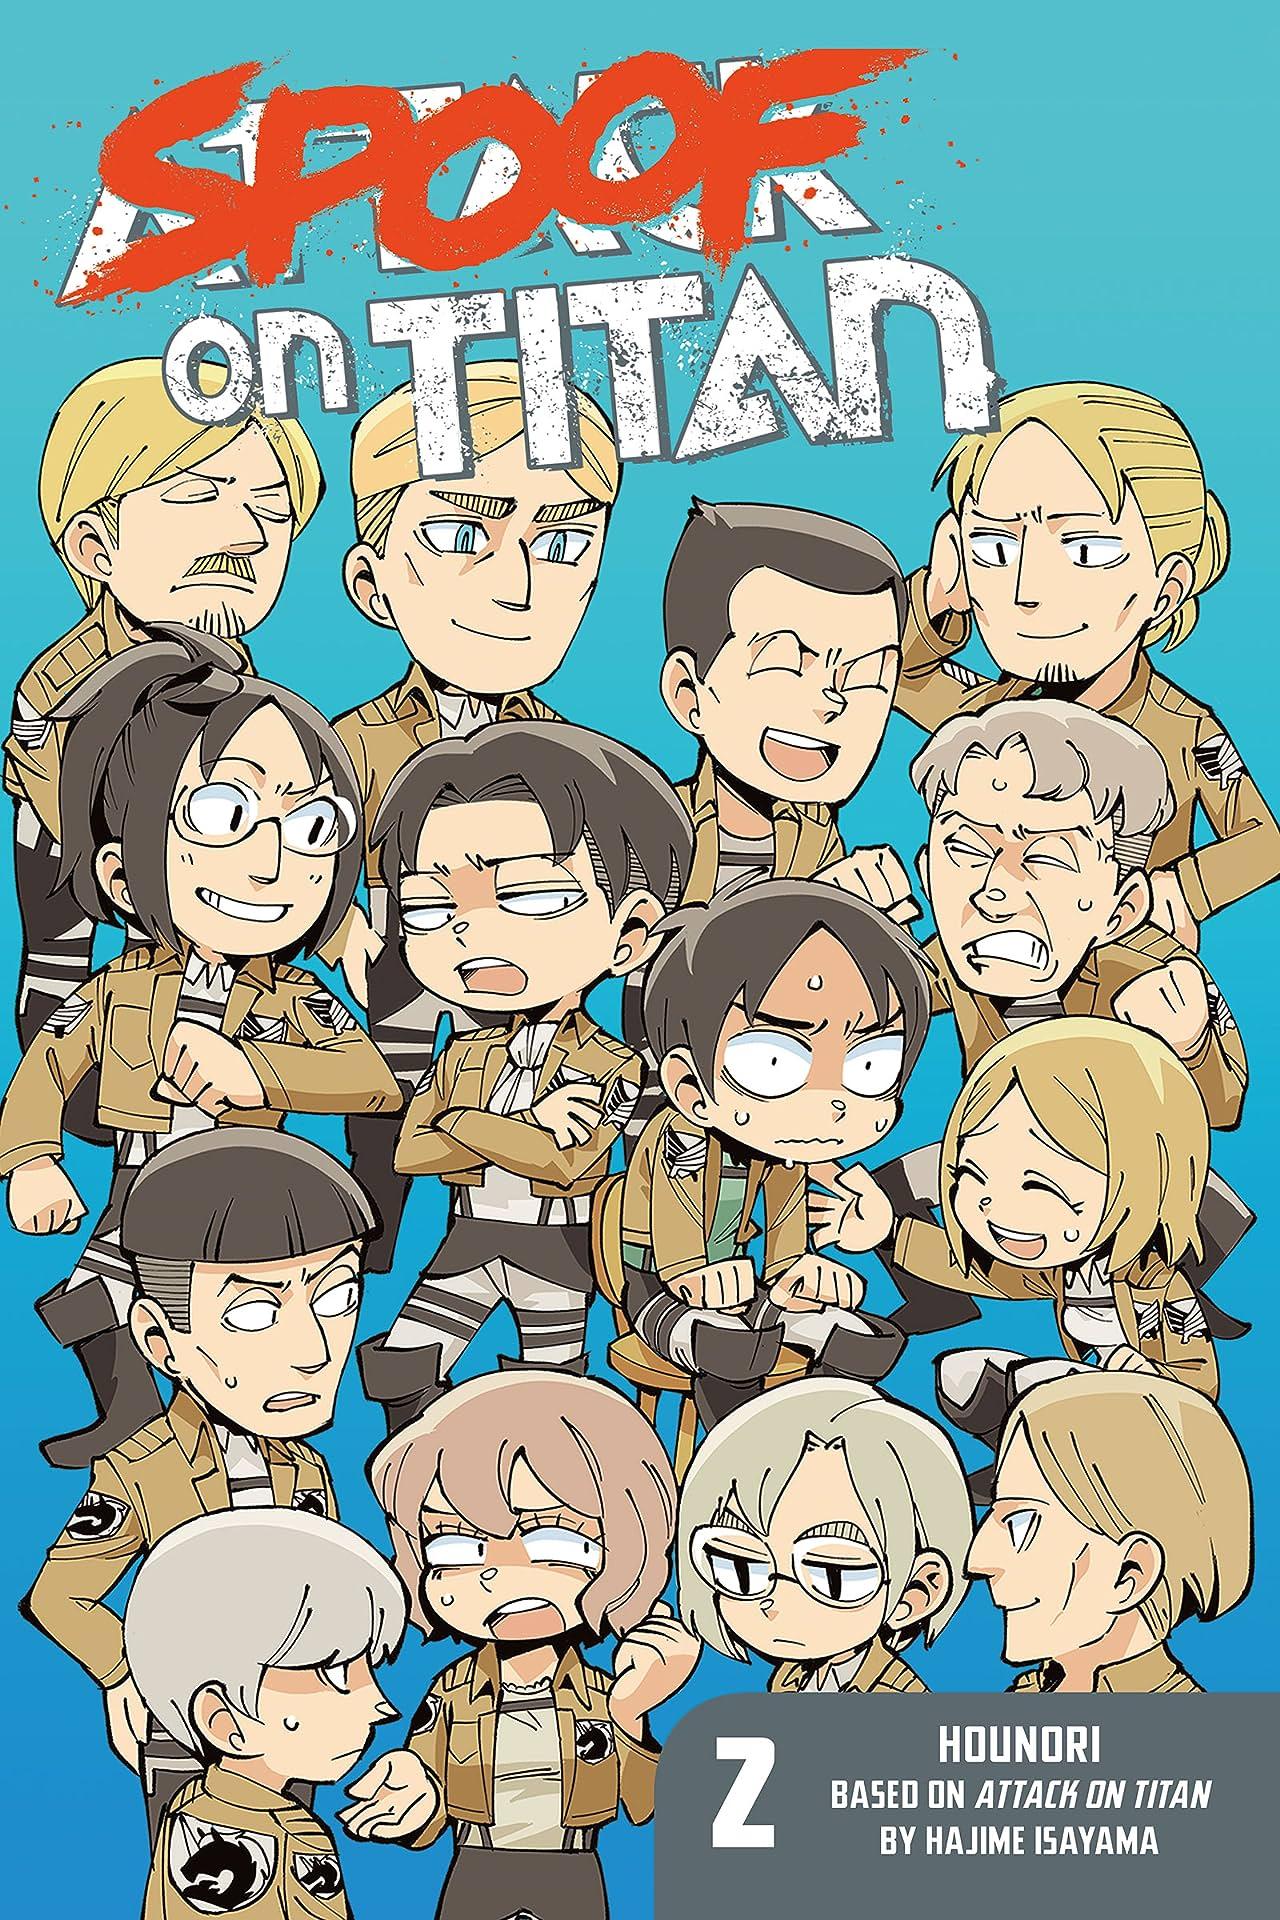 Spoof on Titan Vol. 2